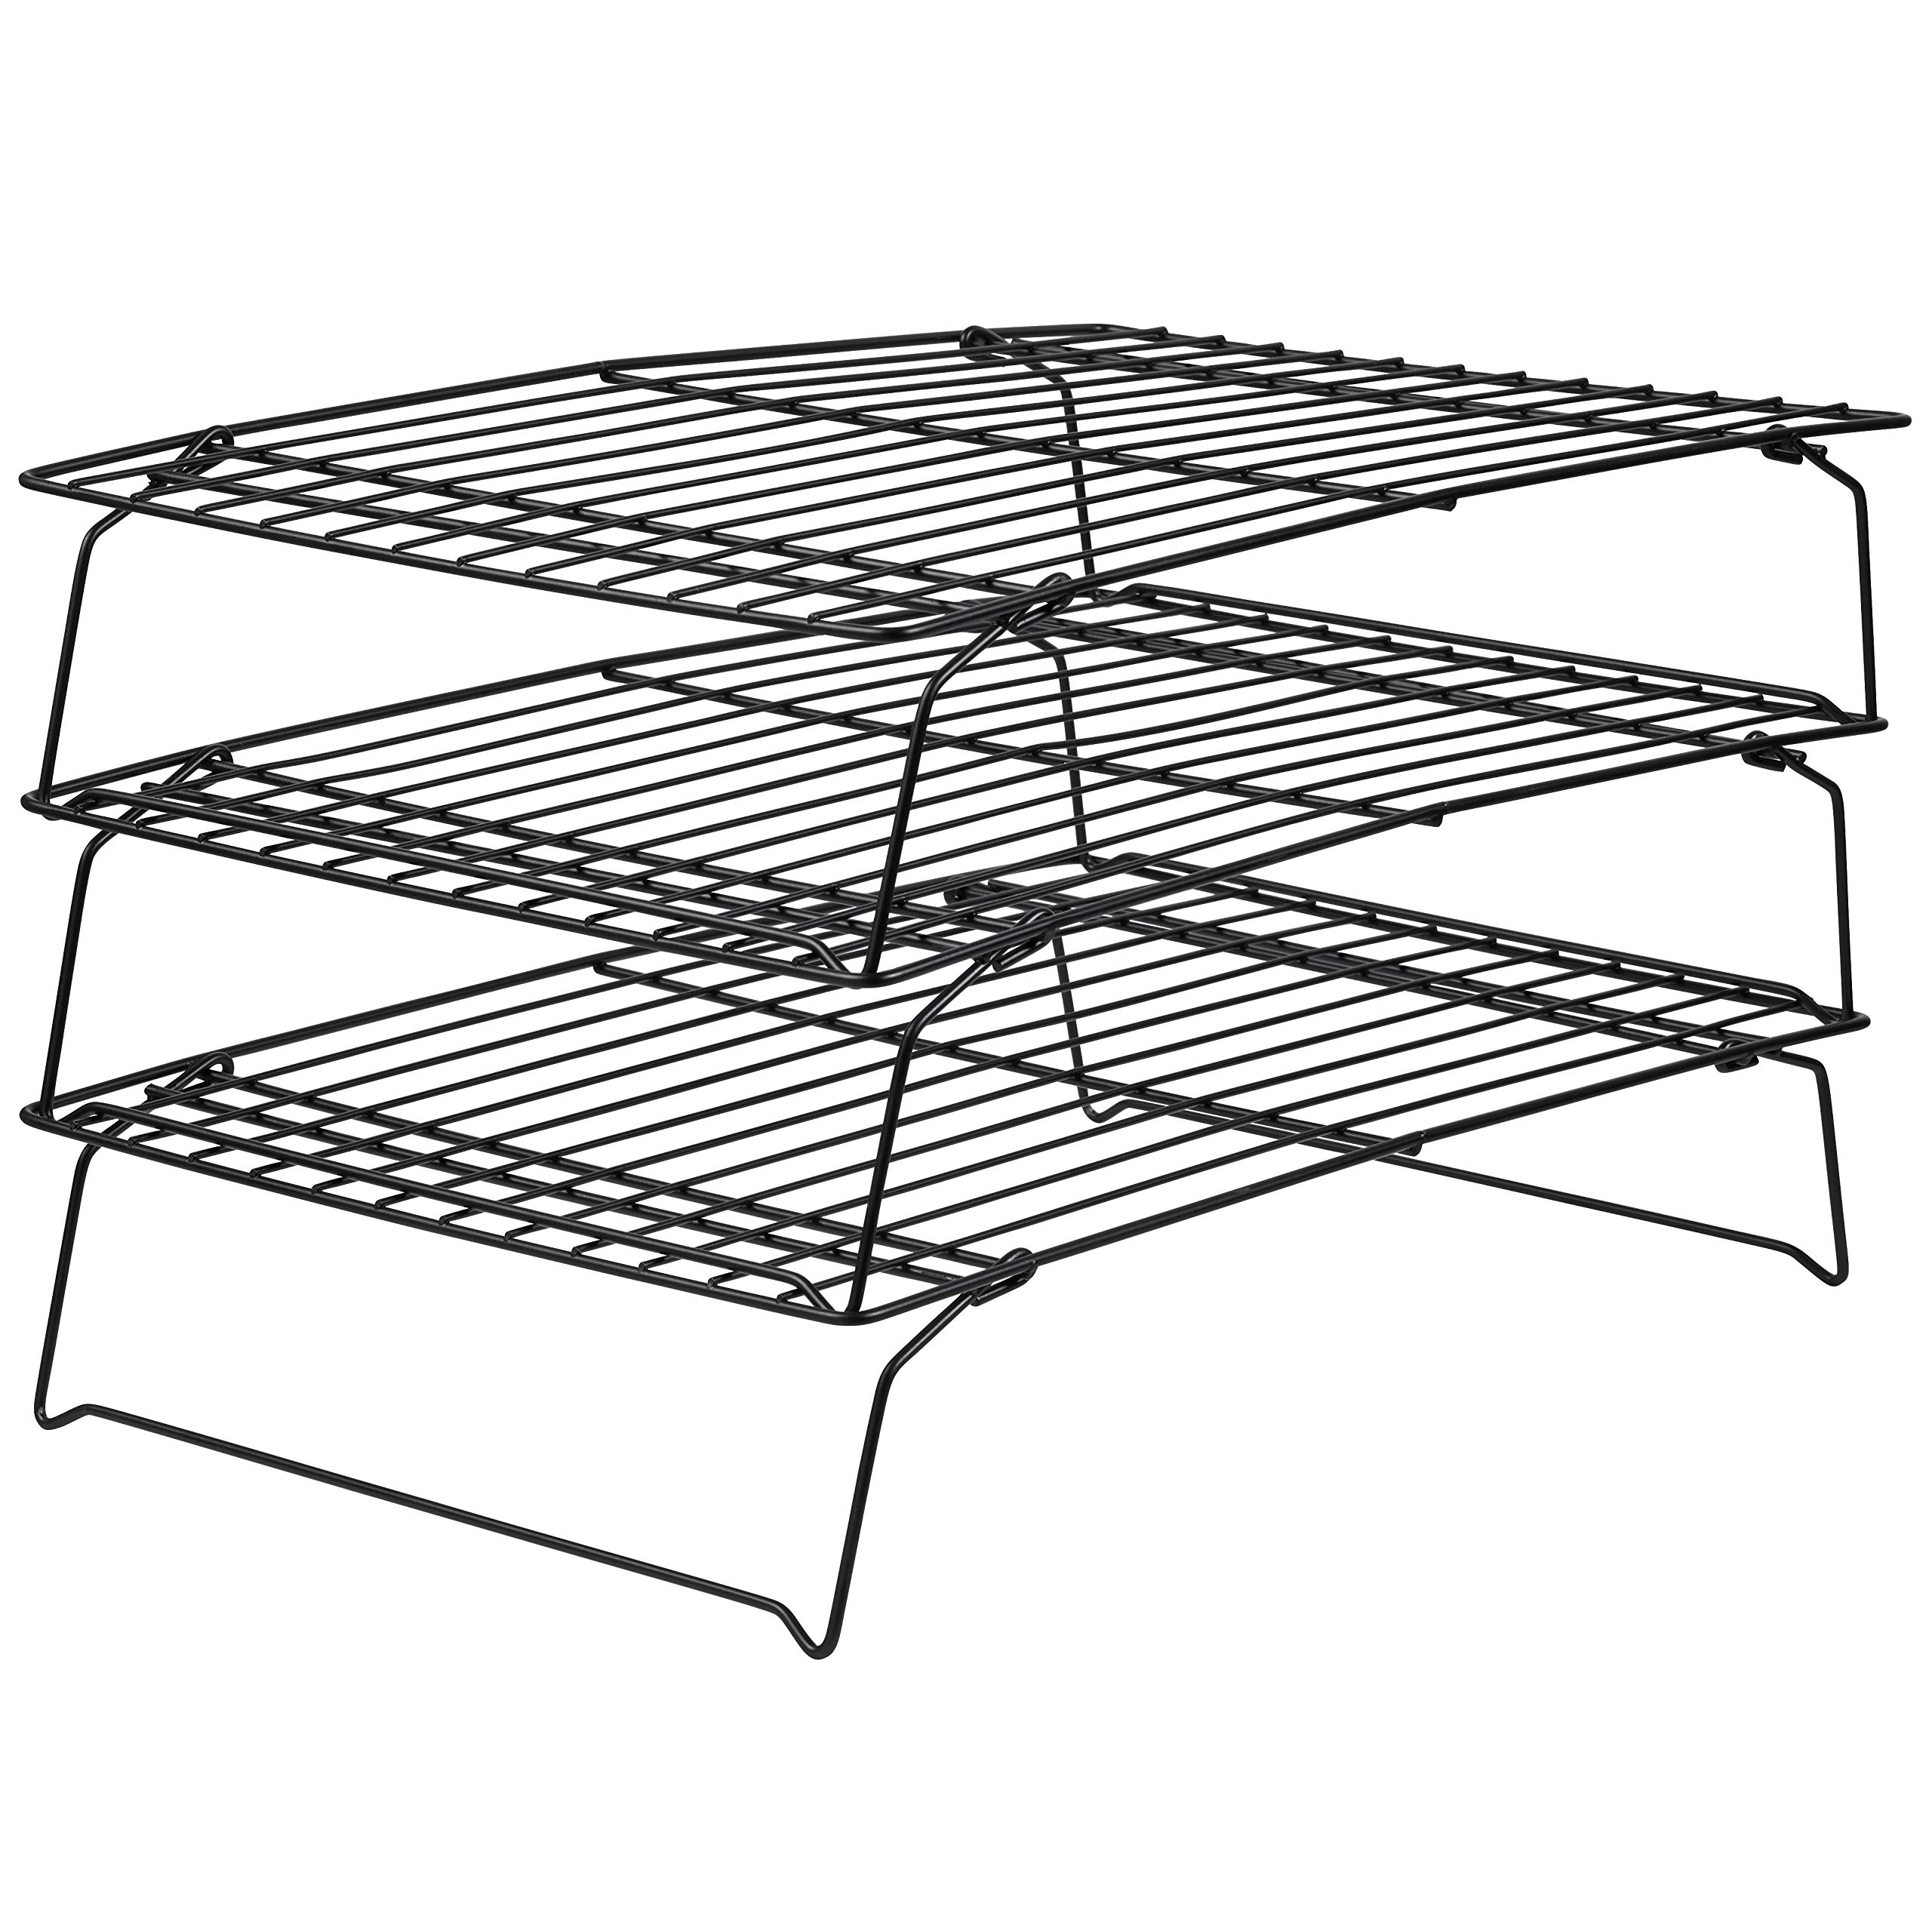 Wilton Rejilla para Enfriar repostería, 3 Niveles, Aluminio, Negro, Centimeters product image